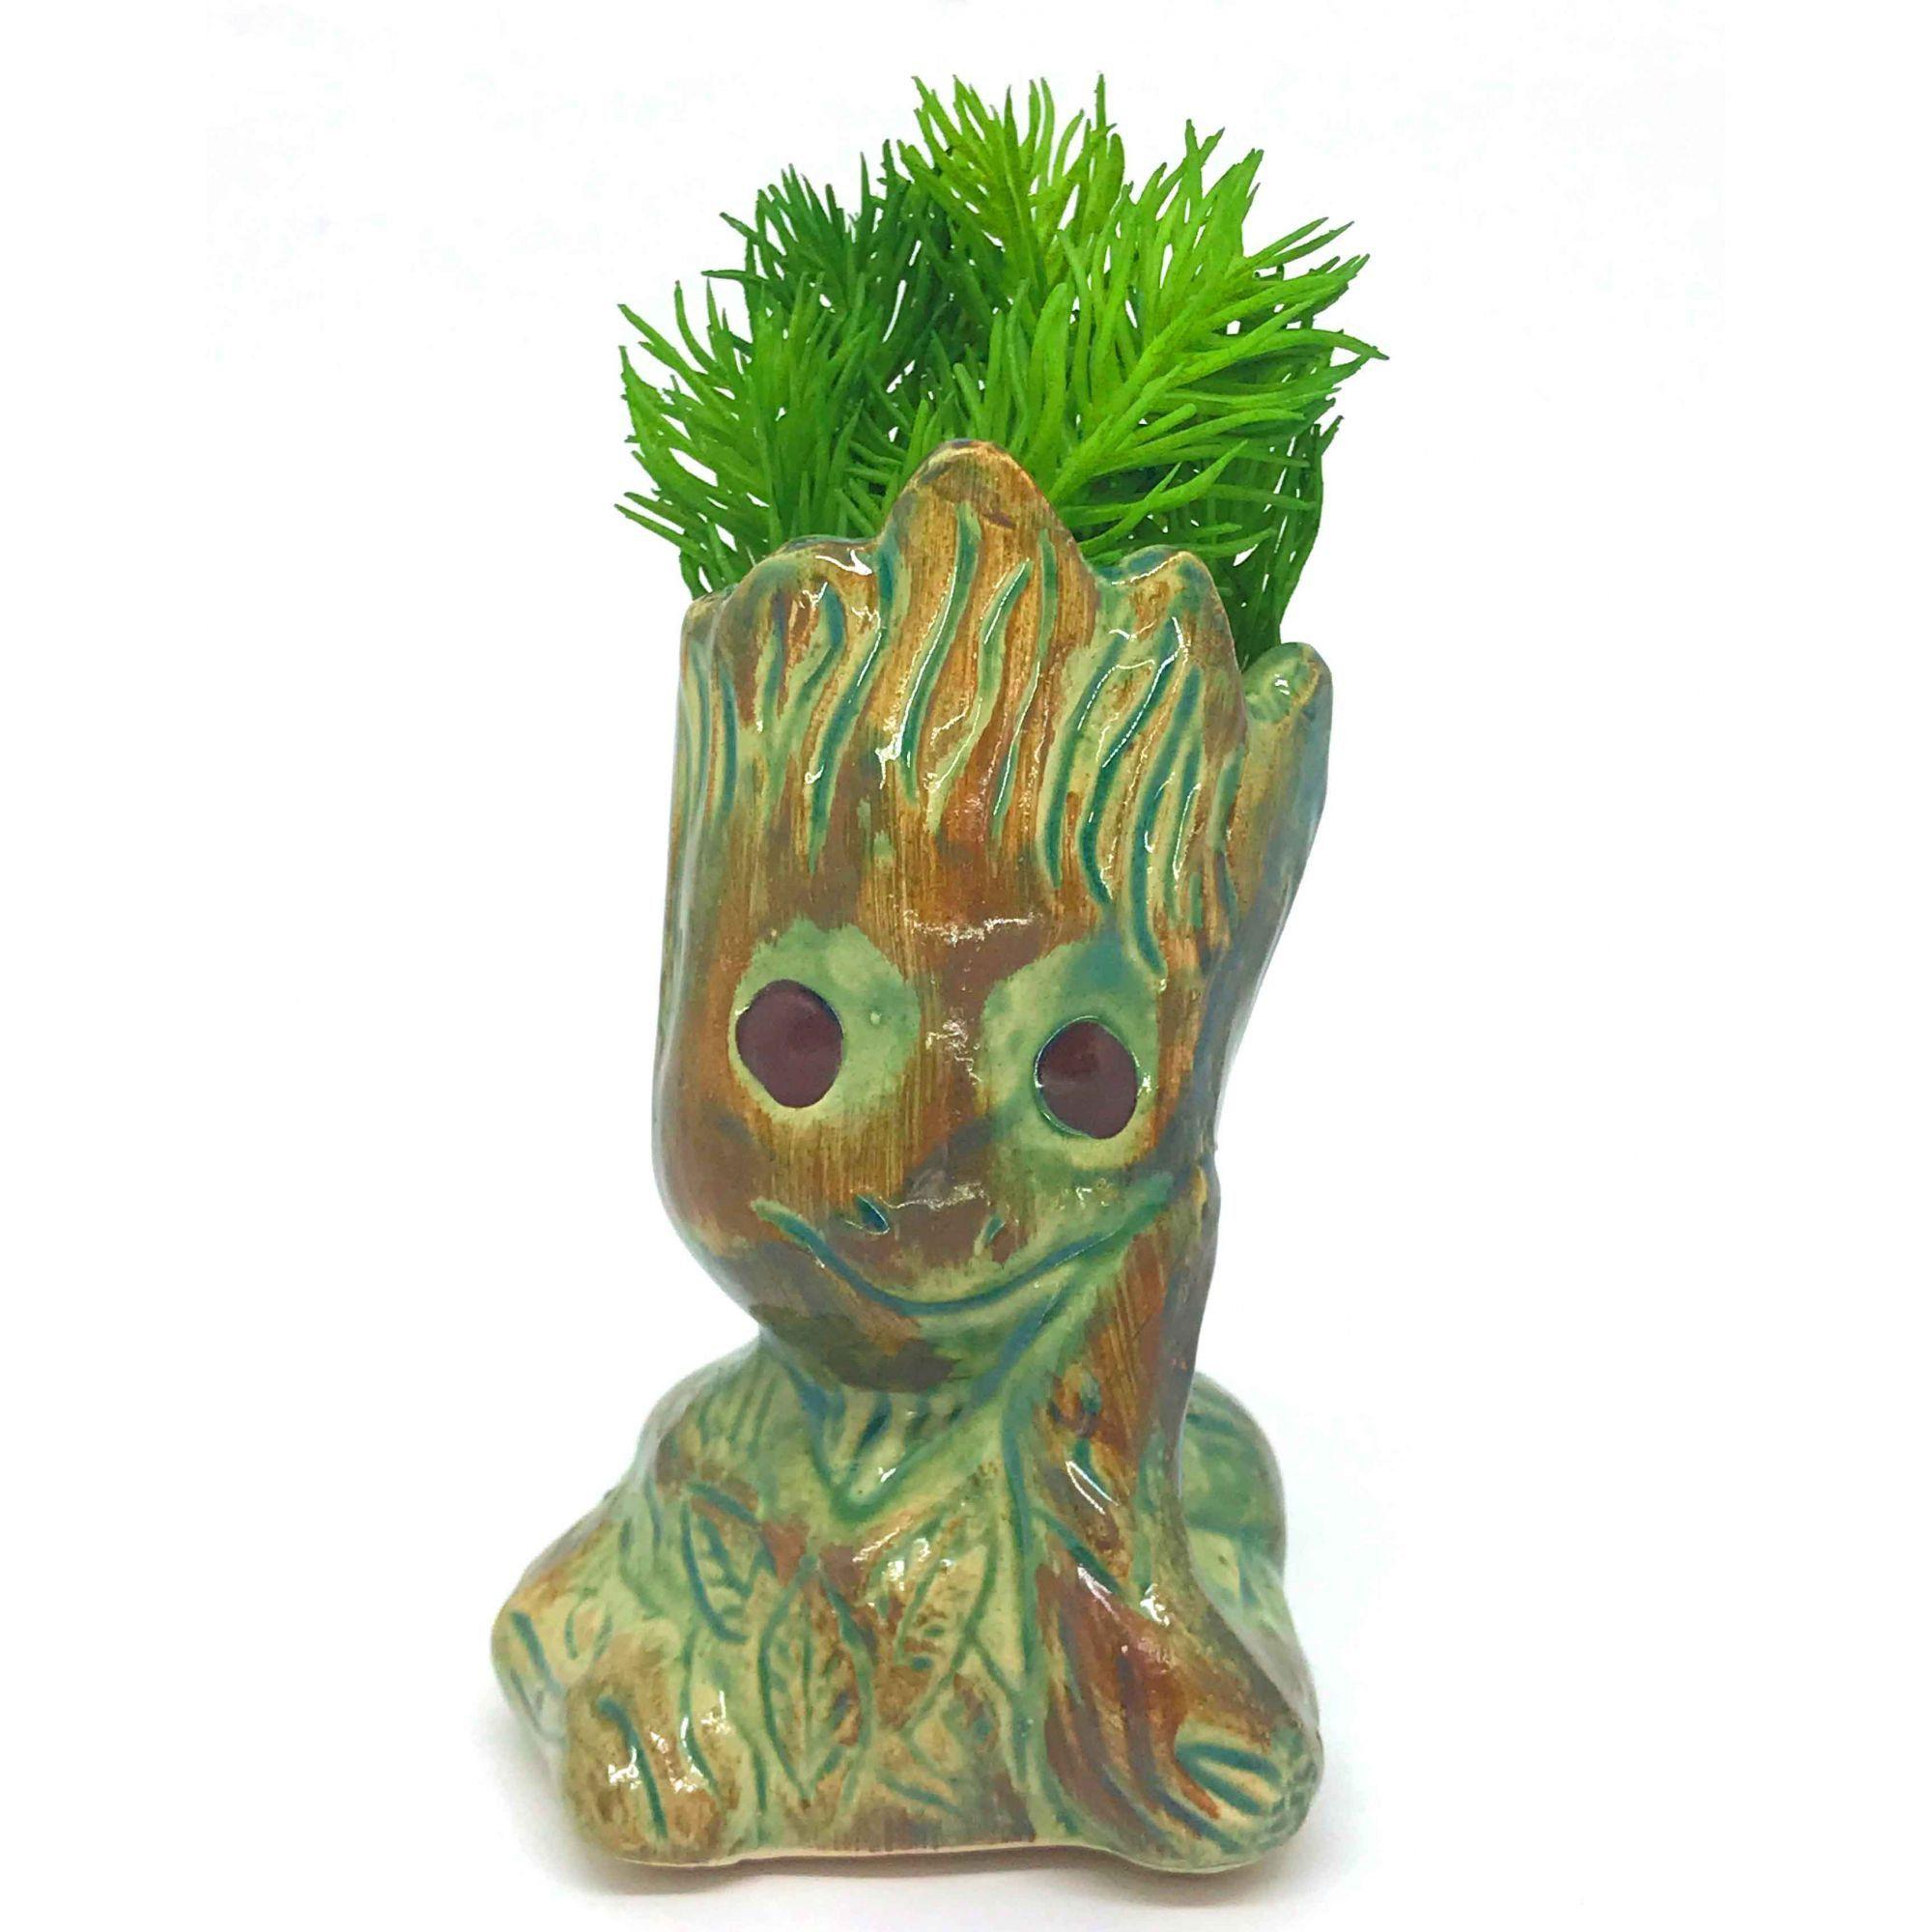 Vaso de Cerâmica Groot Verde e Marrom 12cm x 5,5cm